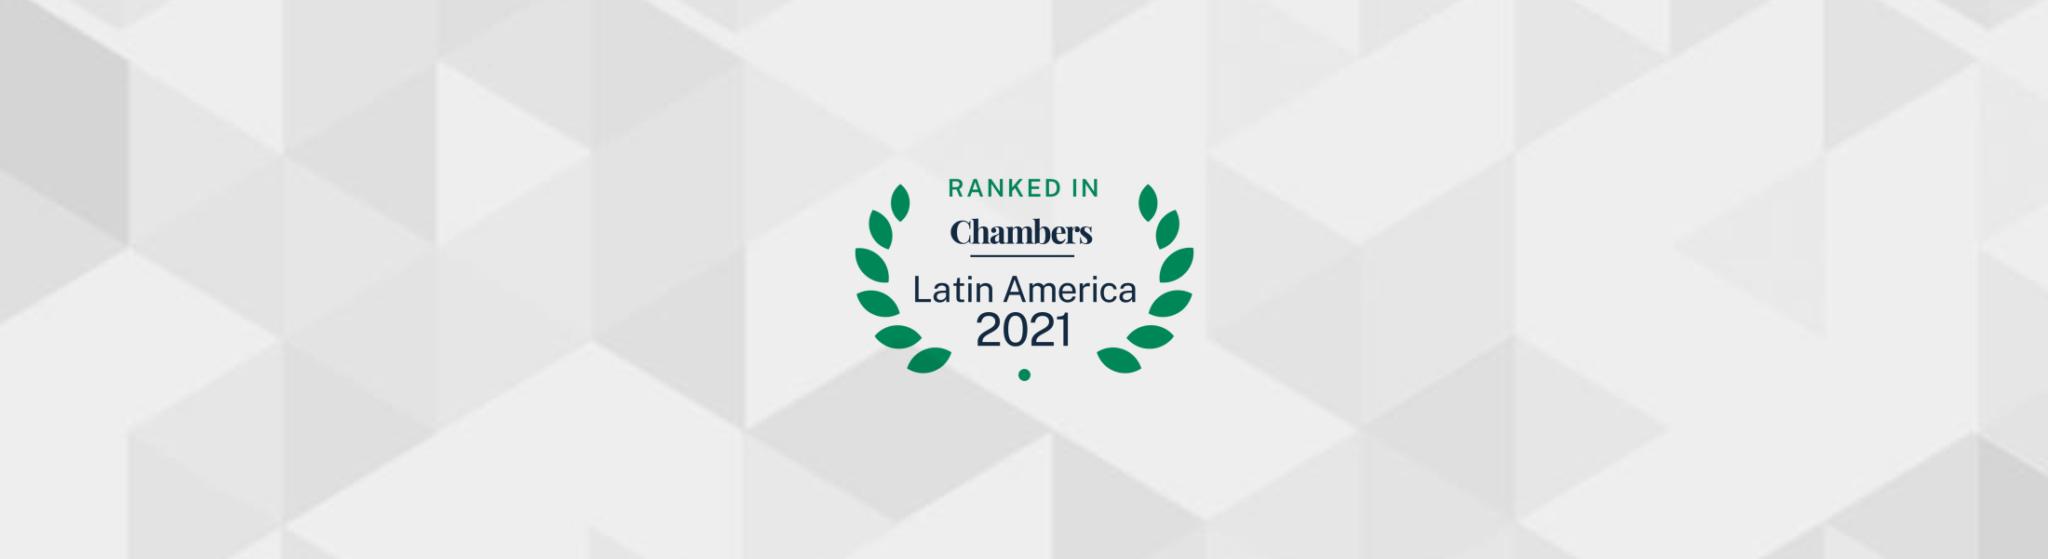 Vernalha Guimarães e Pereira no ranking britânico Chambers Latin America 2021